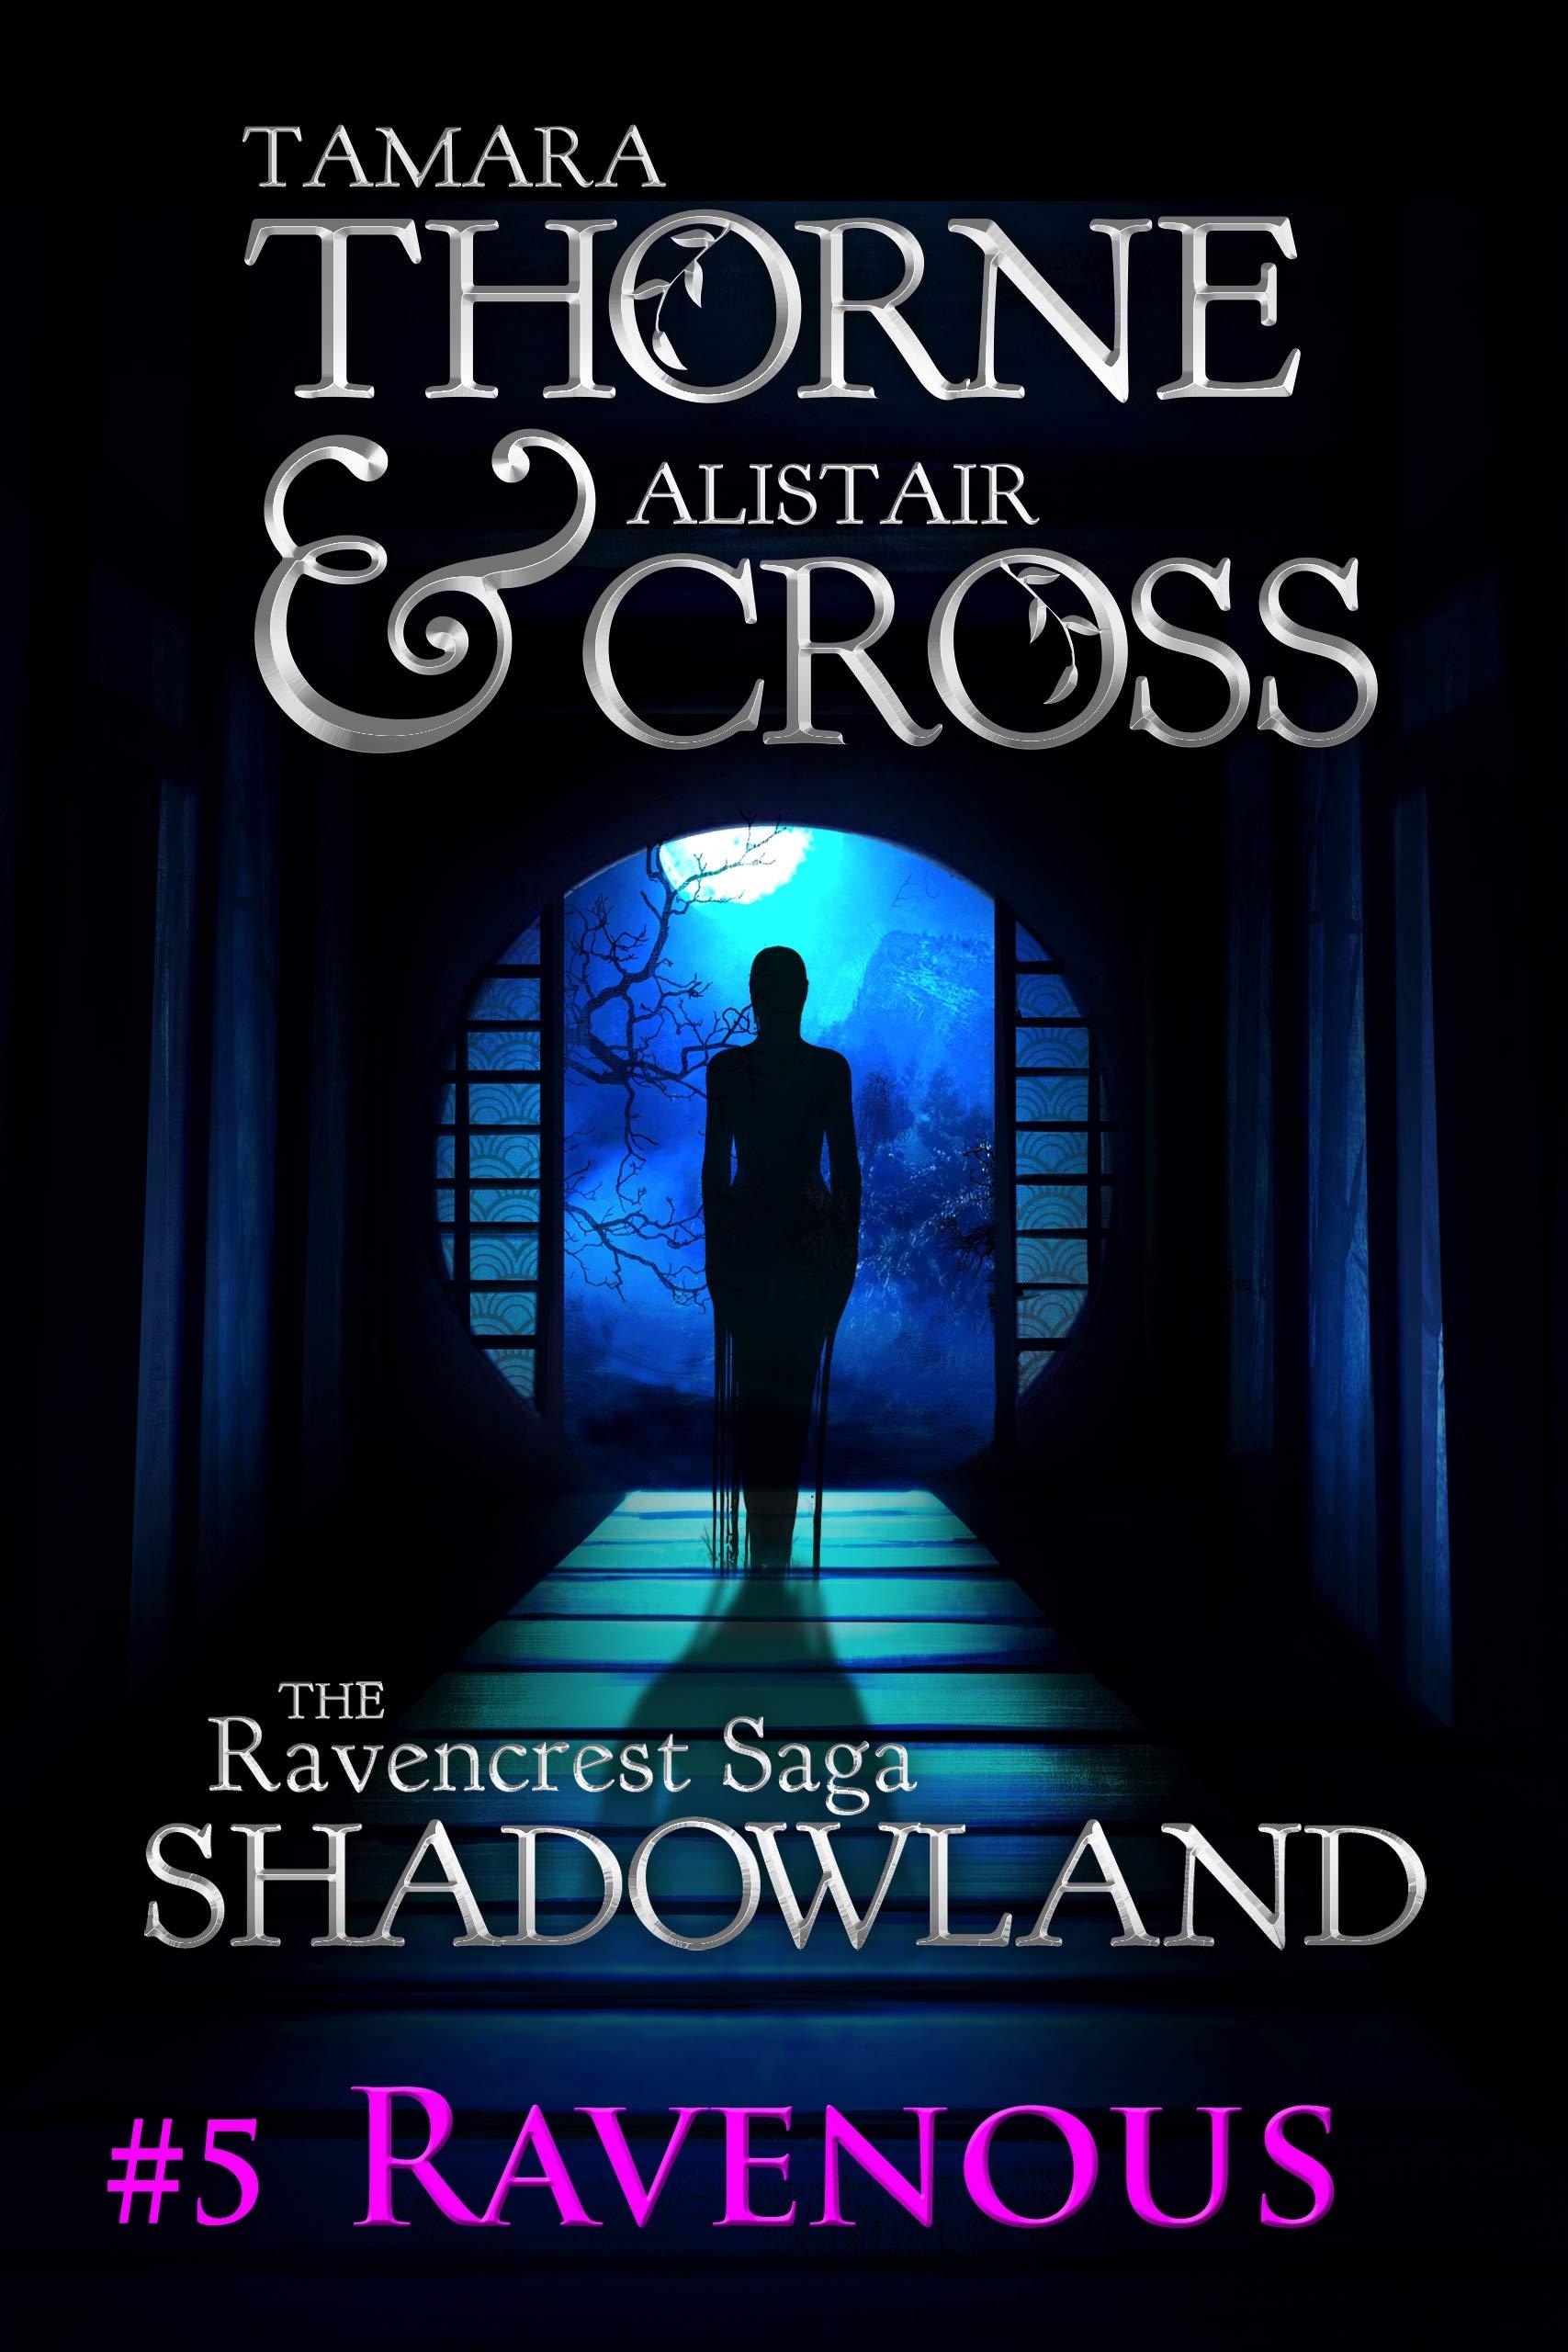 Ravenous: The Ravencrest Saga: Shadowland Part 5